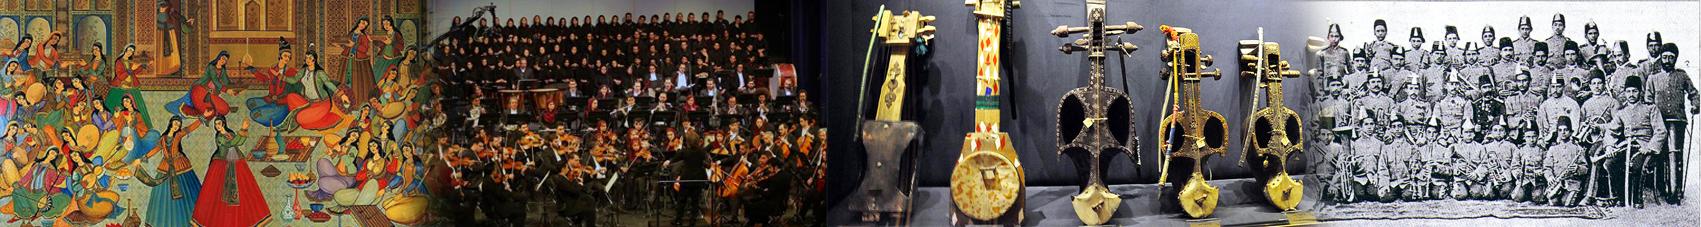 Persian Instrument- Musical instrument- Iran.